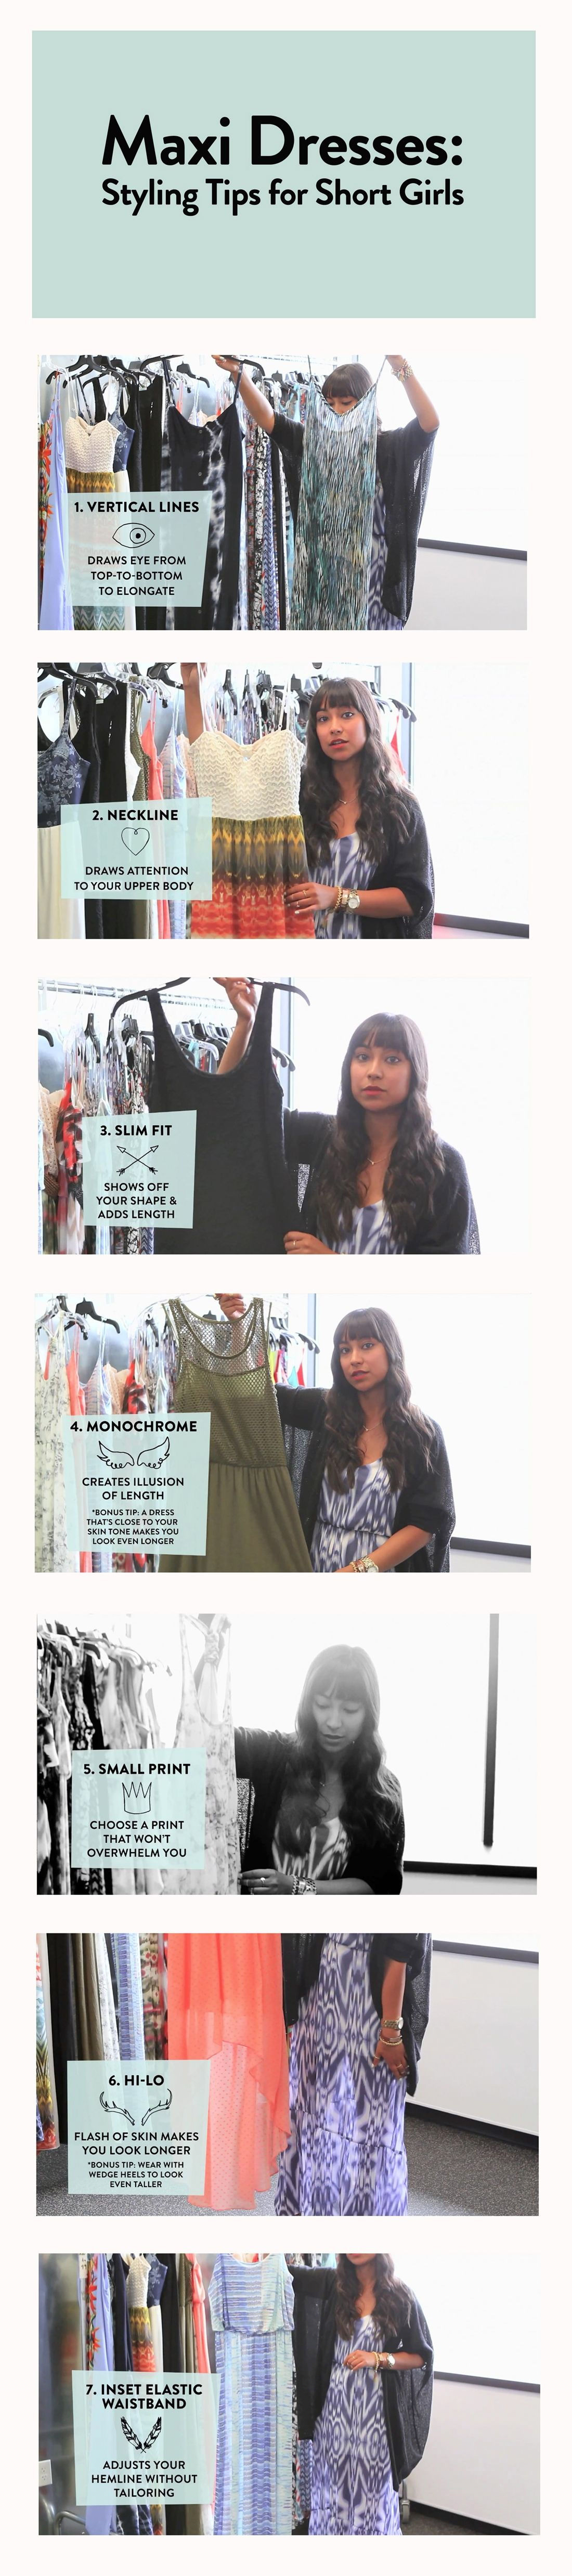 Maxi dresses styling tips for short girls petite rectangle